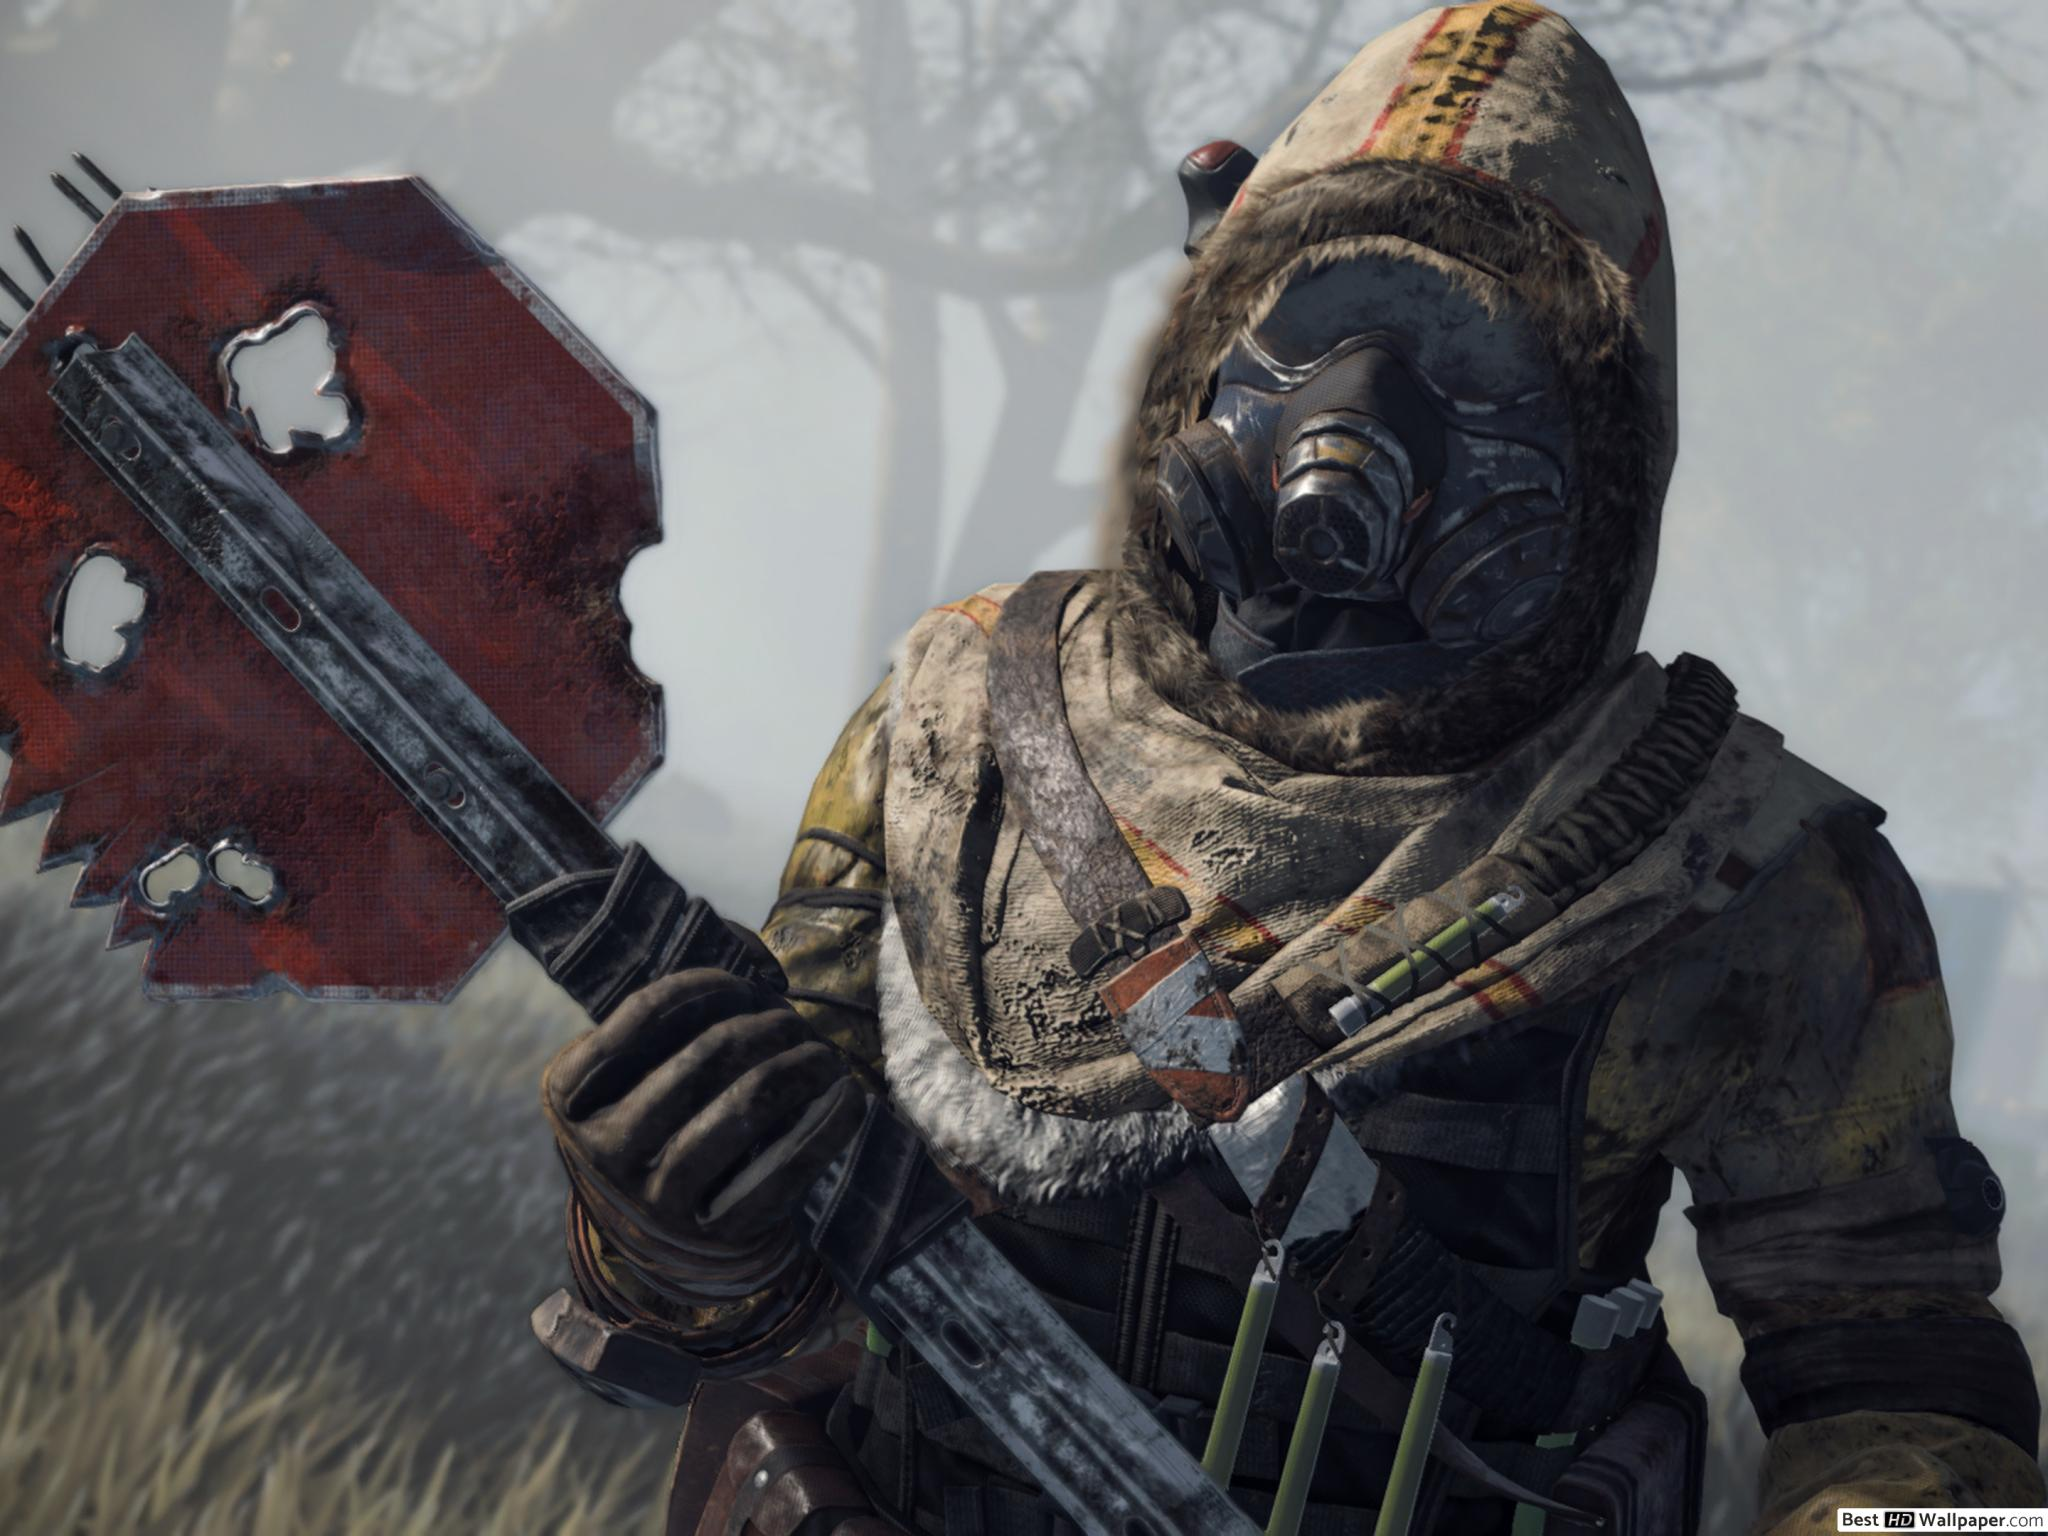 Call Of Duty Black Ops 4 Spectre - HD Wallpaper